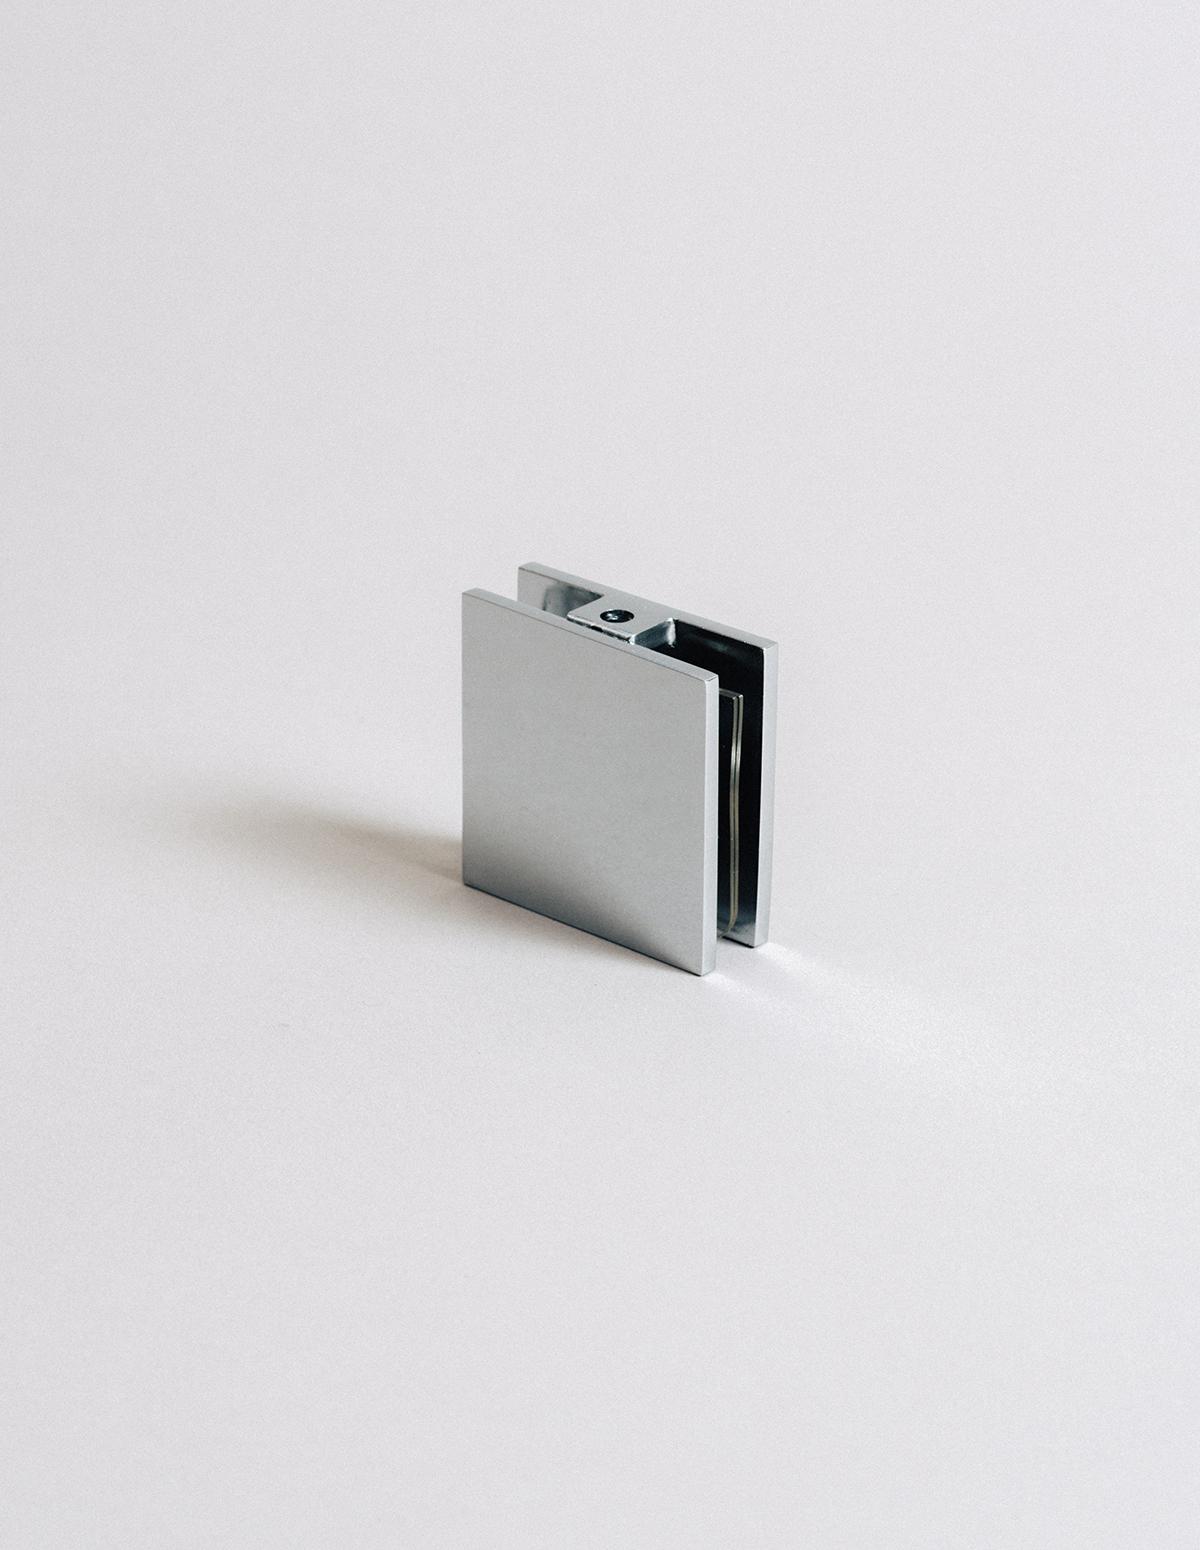 Optimum-Studios-Architectural-Glass-Metal-HardwarePage-GlassClip7-042216